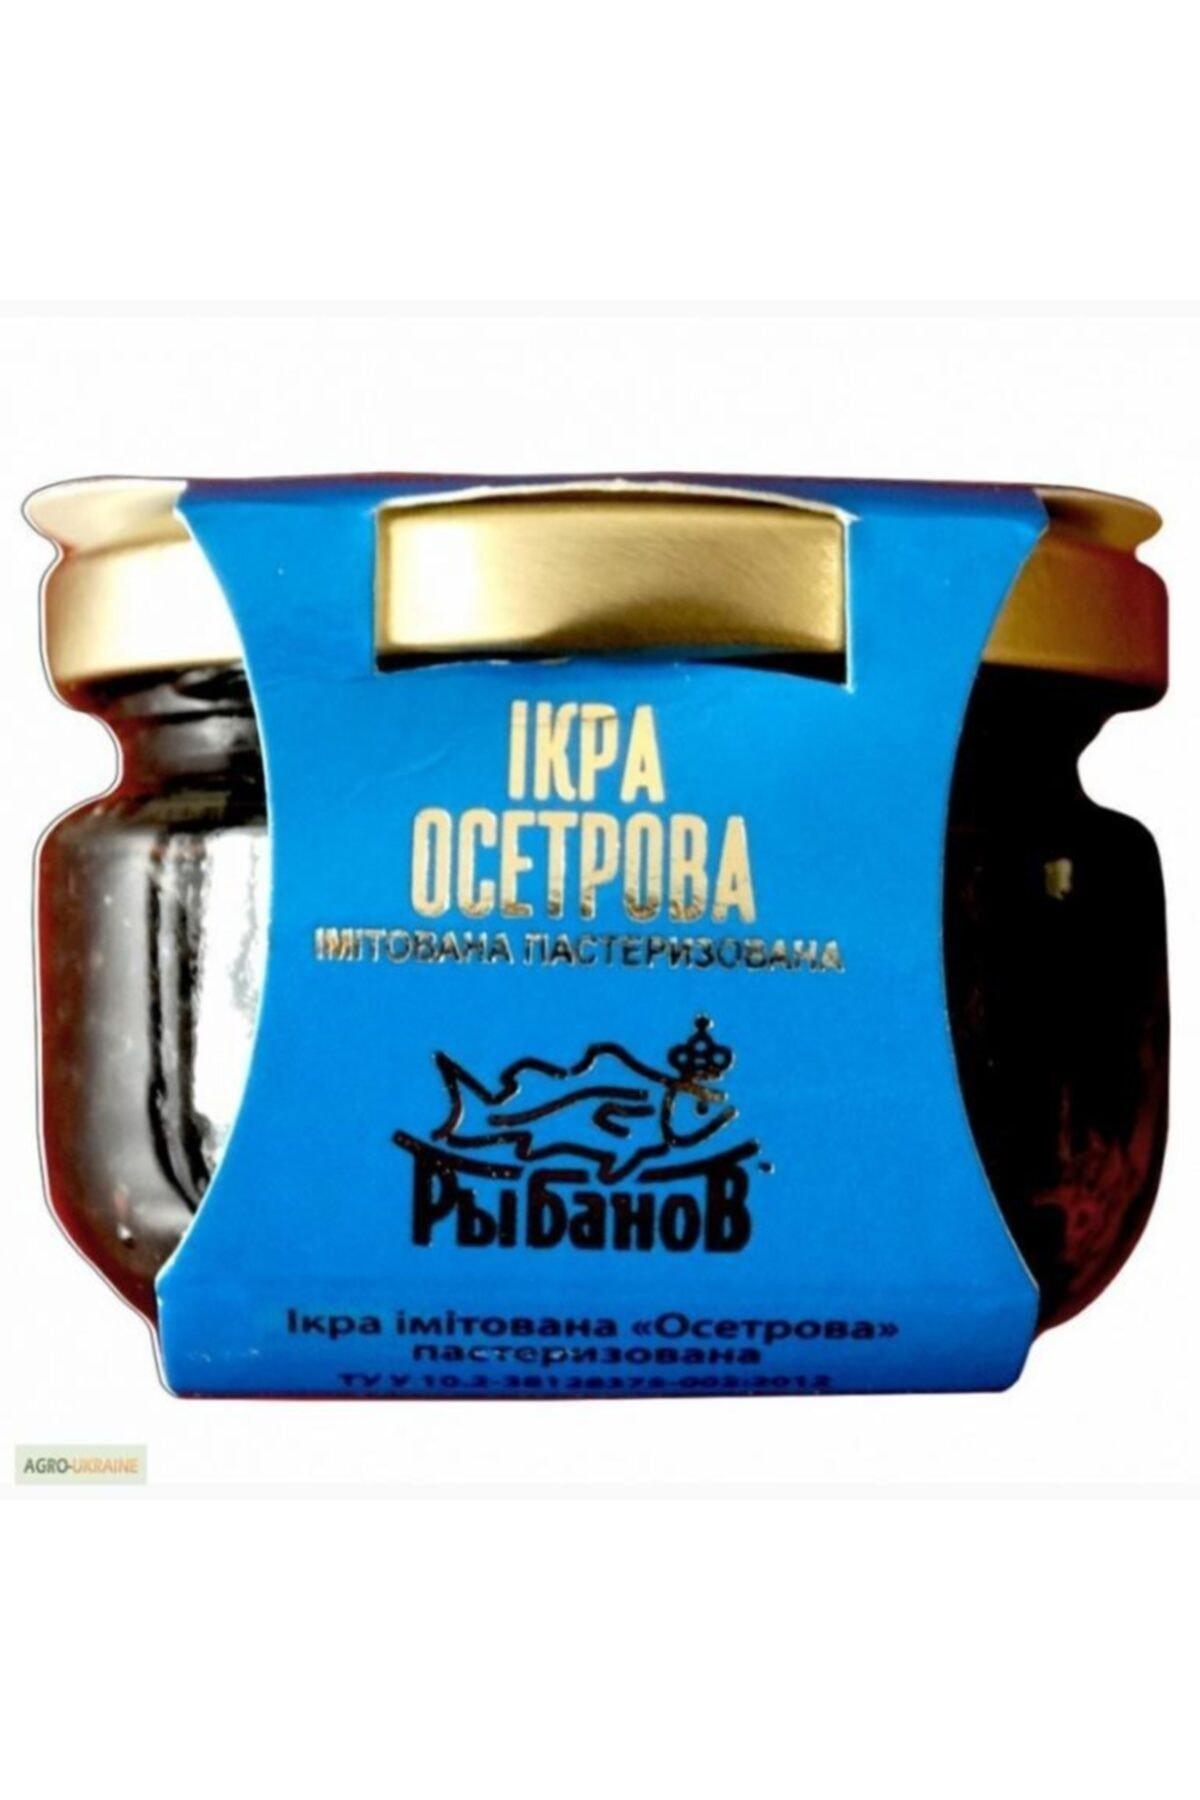 Dardanel Rybanov Siyah Havyar 110gr-asetrin Balığı 1